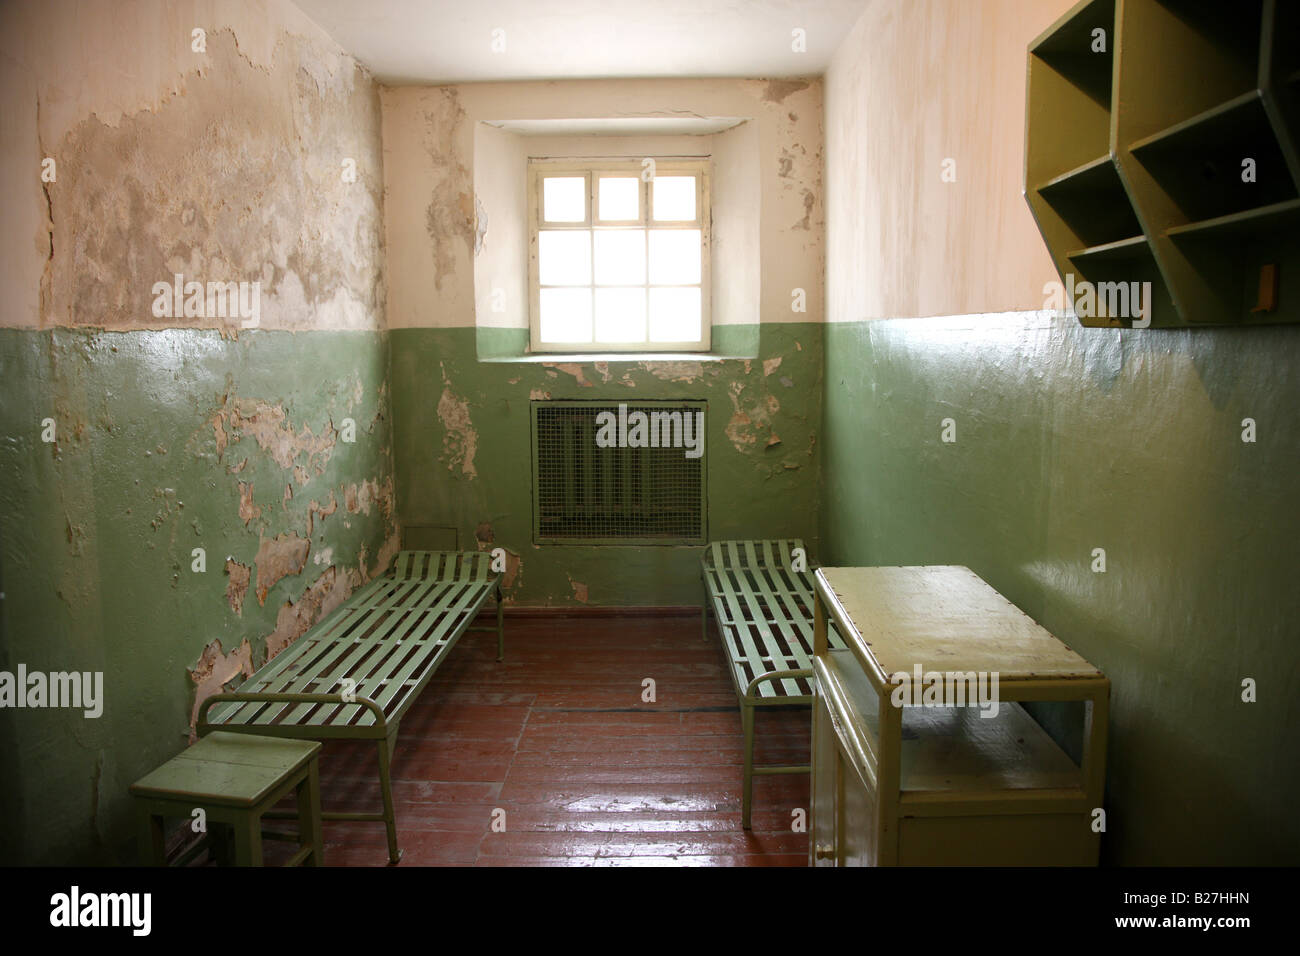 LTU Lithuania Capital Vilnius Museum of Genocide Victims KGB Museum - Stock Image